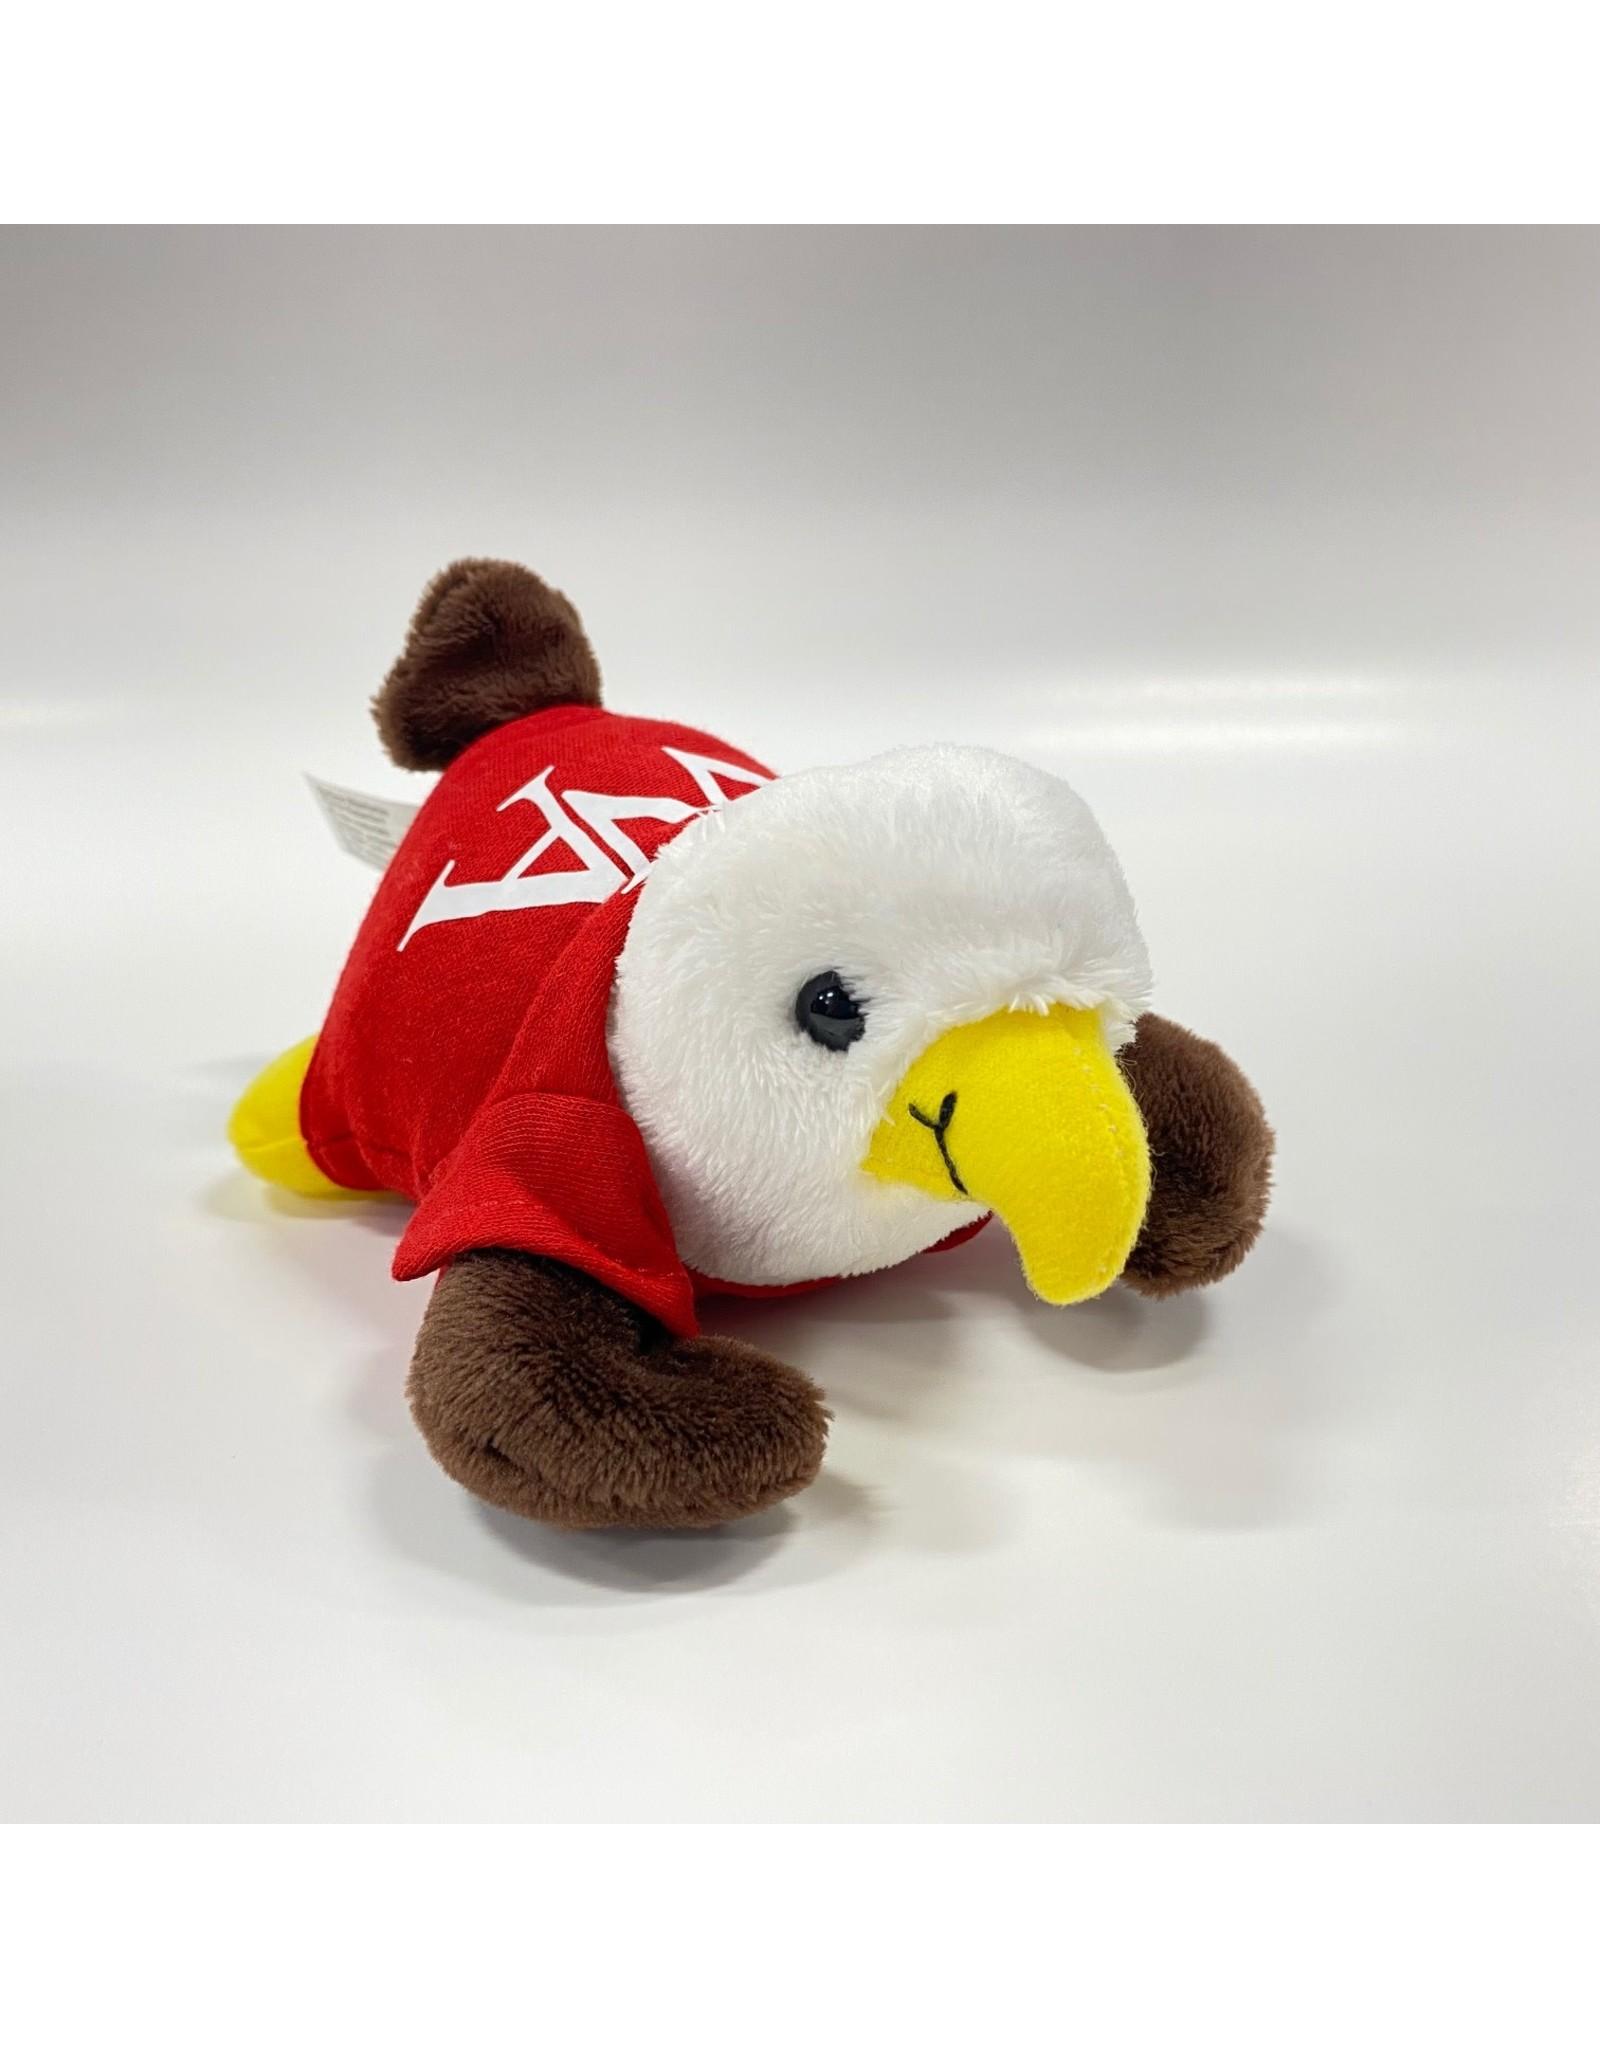 Mascot Factory Plush Chublet - Eagle